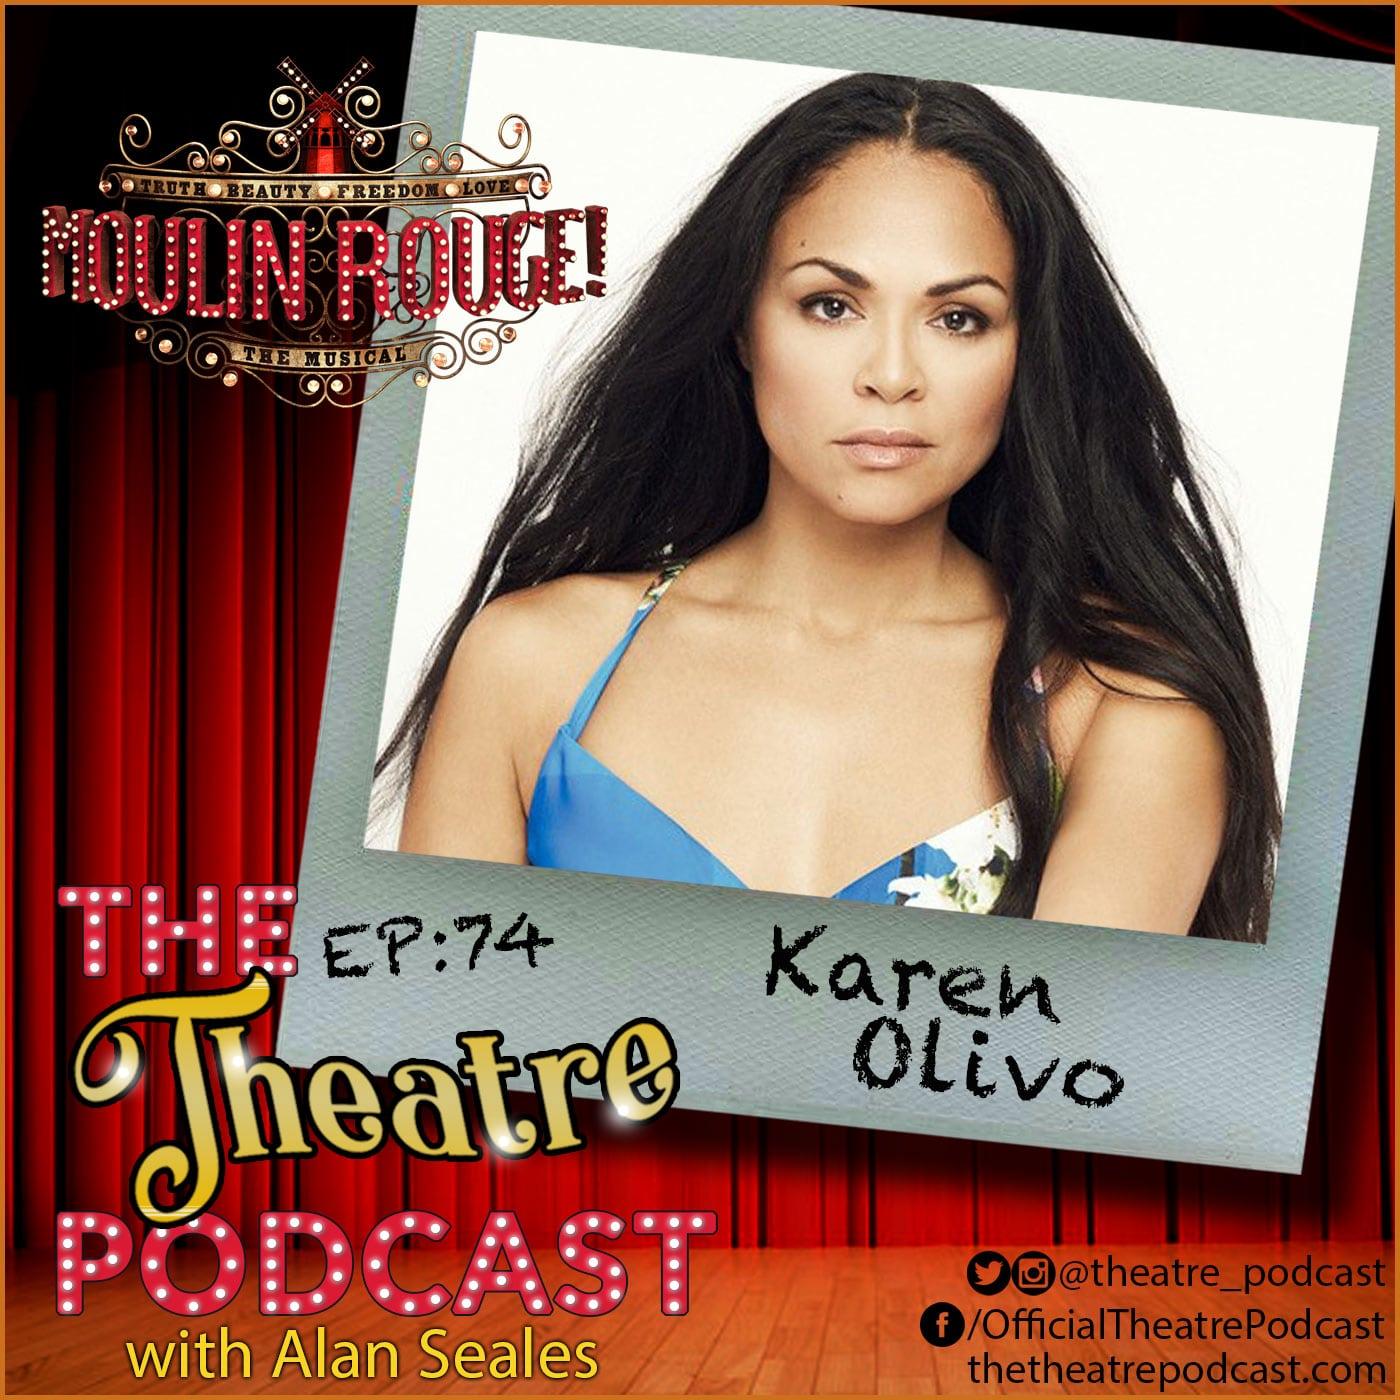 The Theatre Podcast Episode 74 Karen Olvio